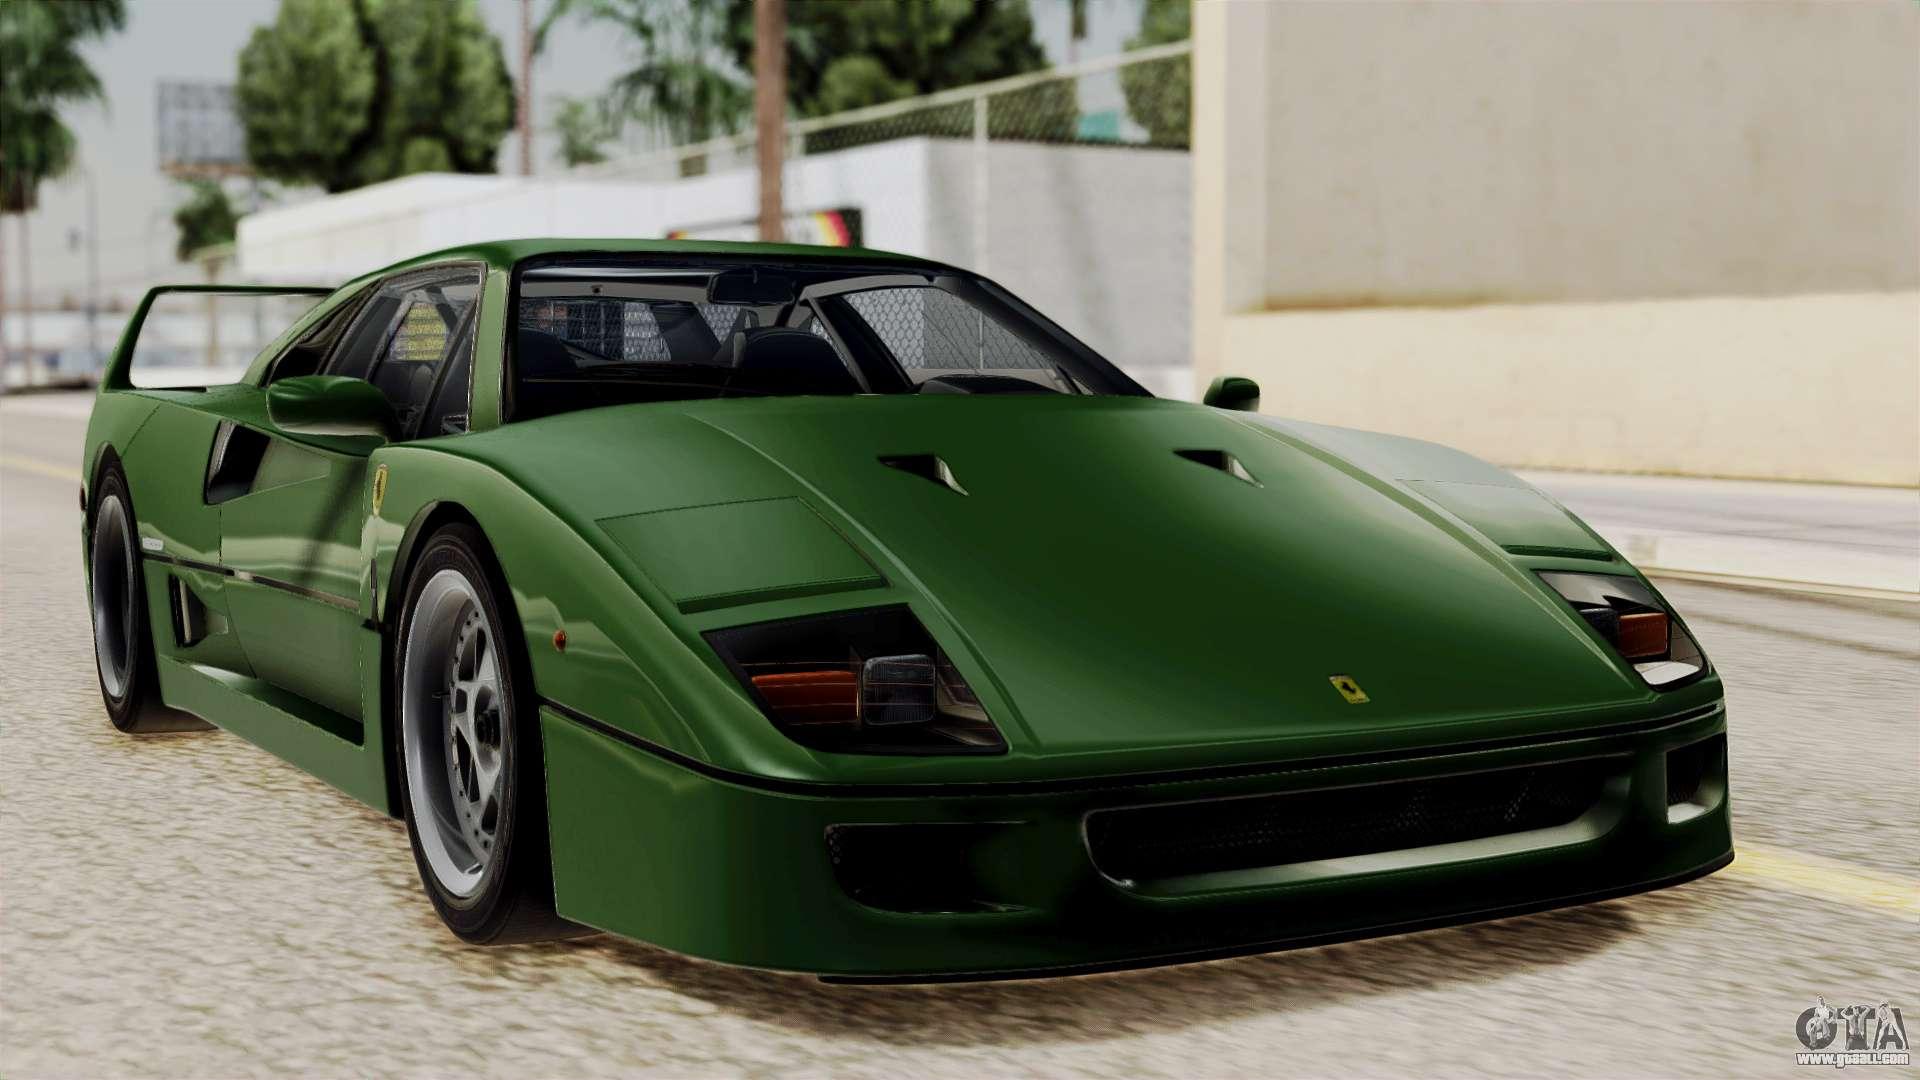 Ferrari f40 1987 for gta san andreas ferrari f40 1987 with up without bonnet ivf vanachro Choice Image